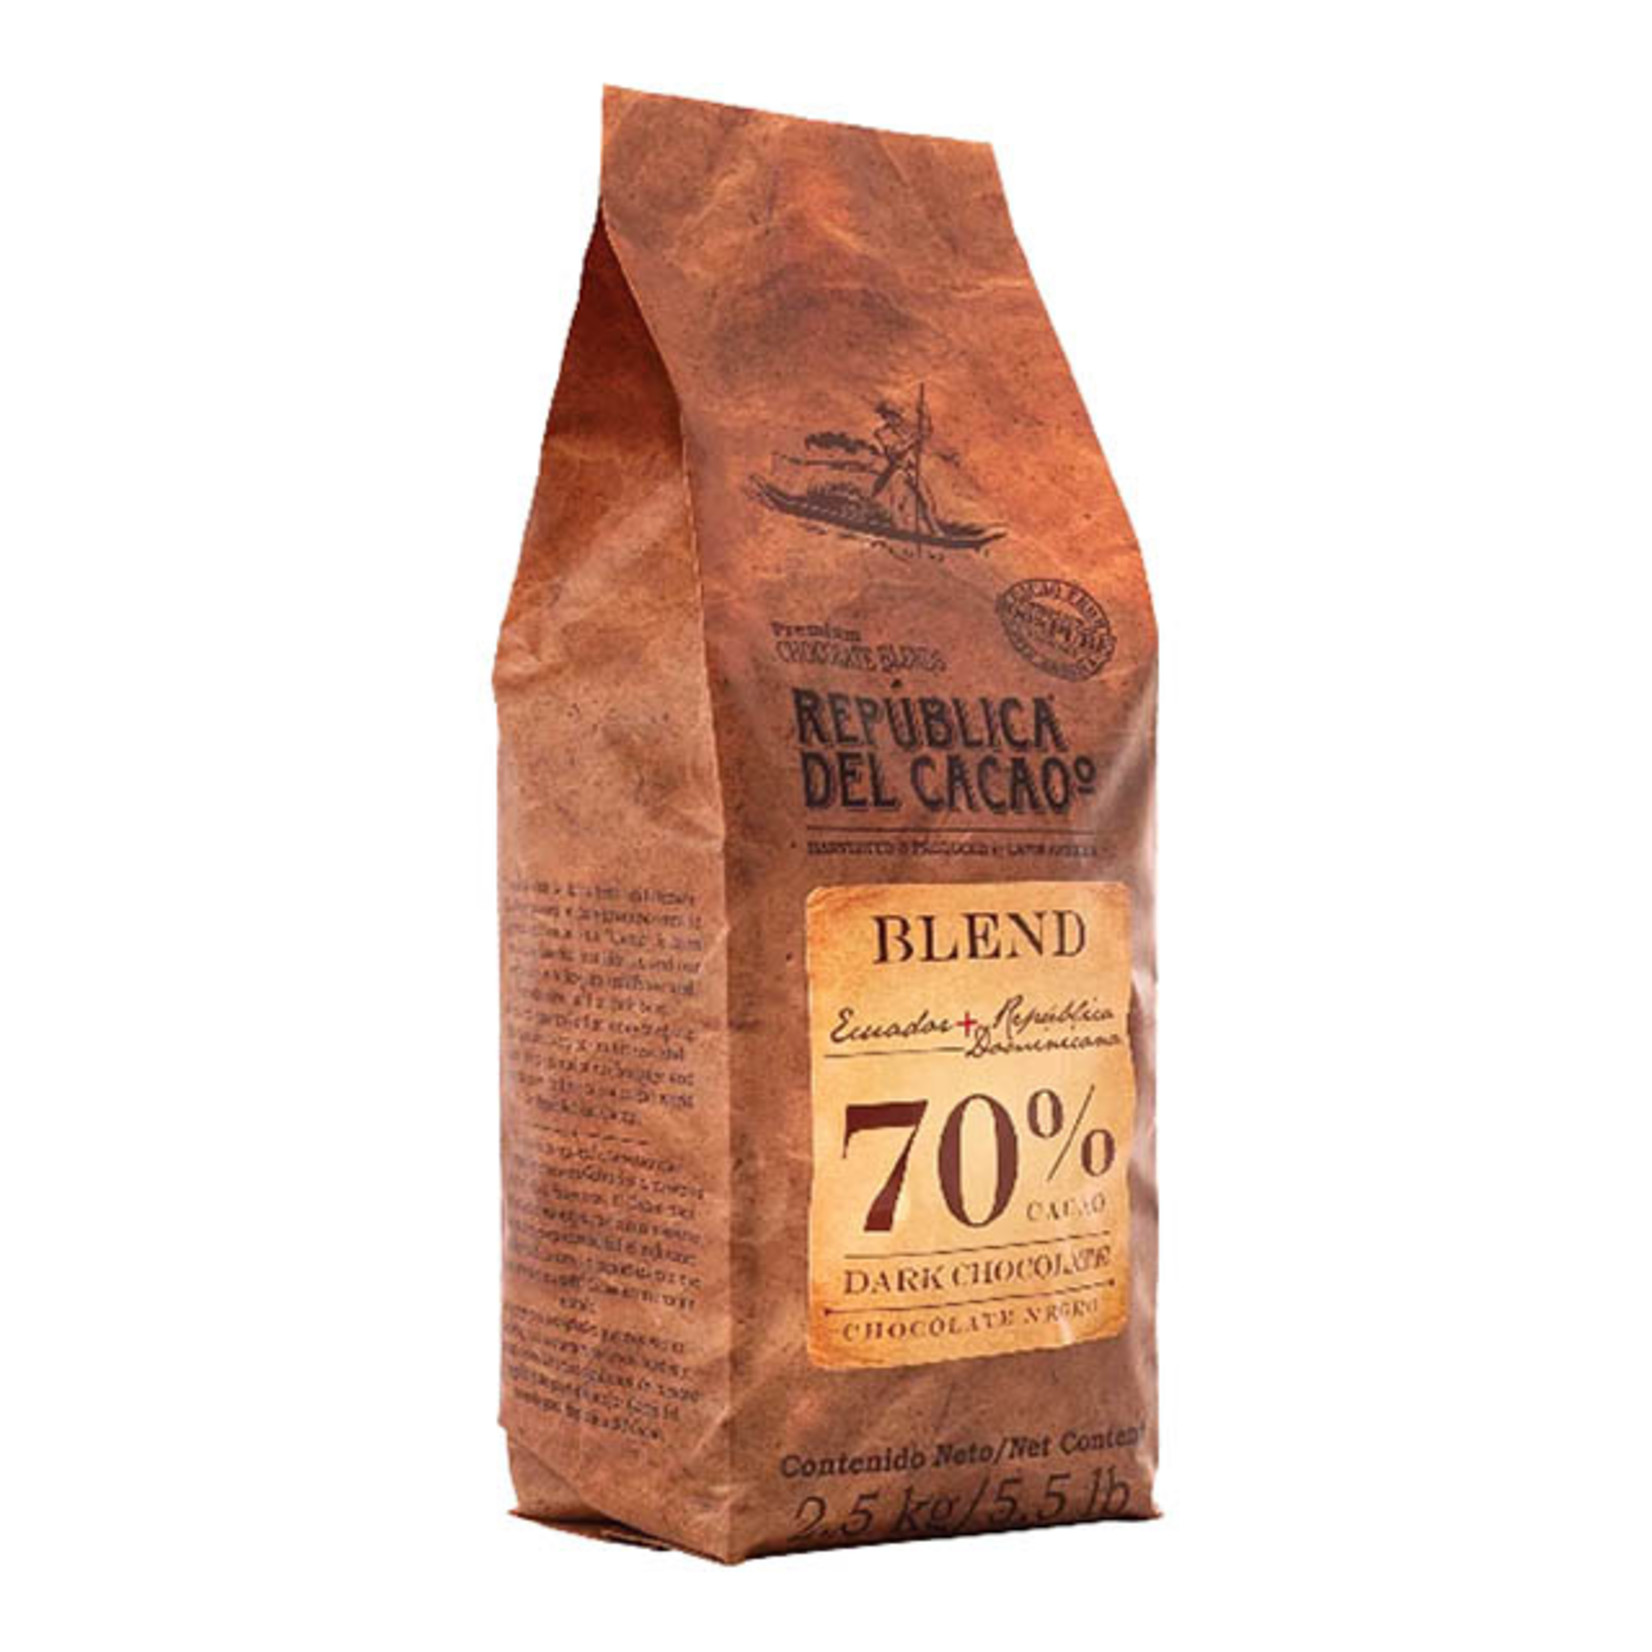 Republica del Cacao Republica de Cacao - Ecuador Blend Dark 70% Couverture - 5.5lb, 18836